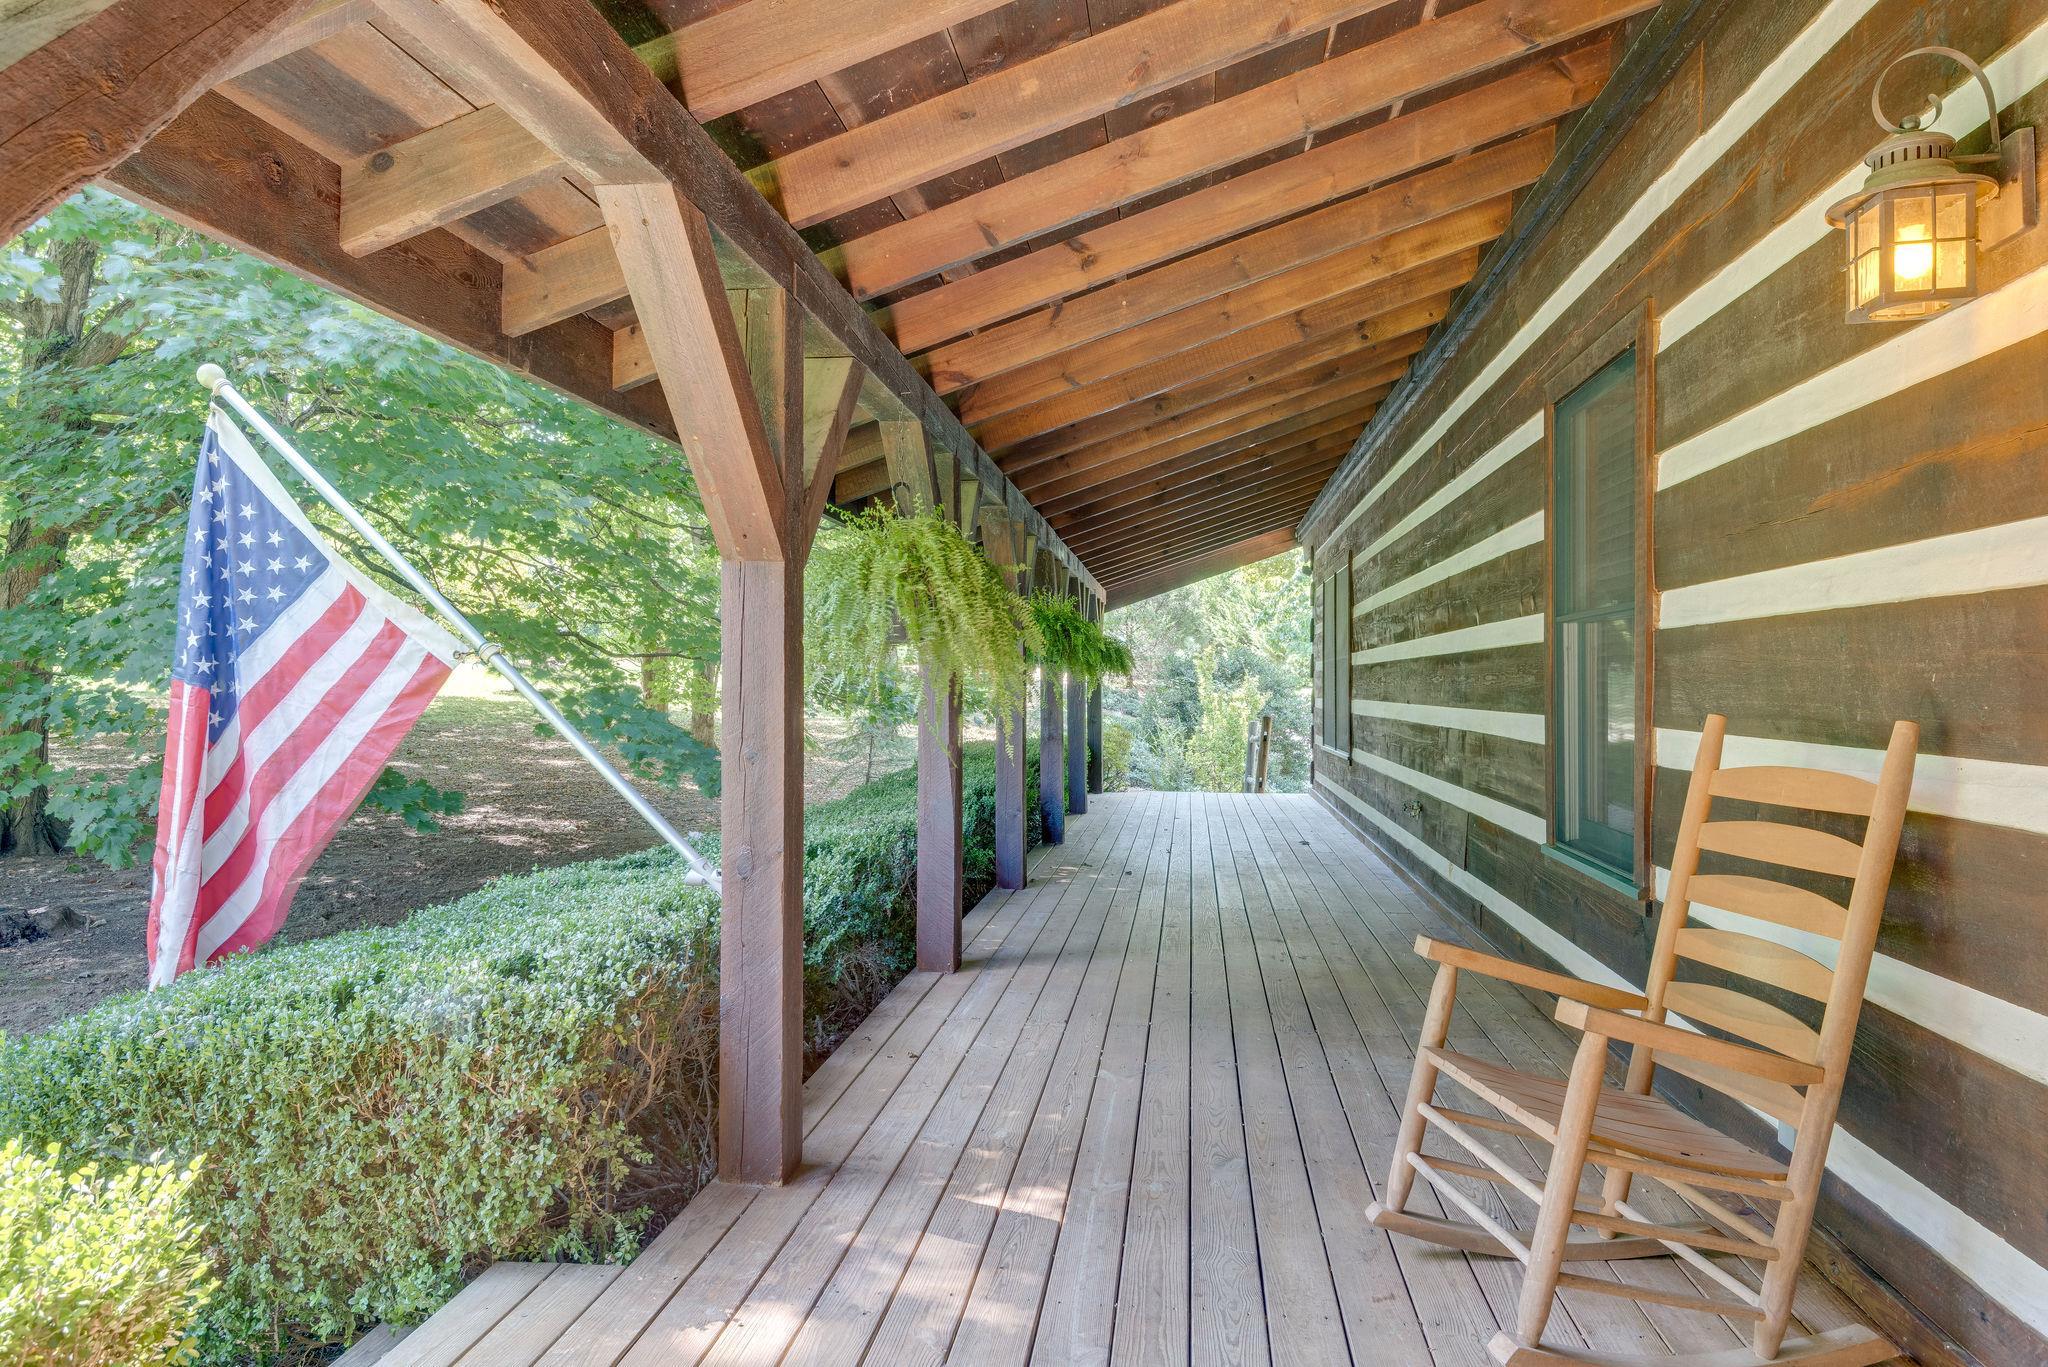 1500 Deal Rd, Burns, TN 37029 - Burns, TN real estate listing